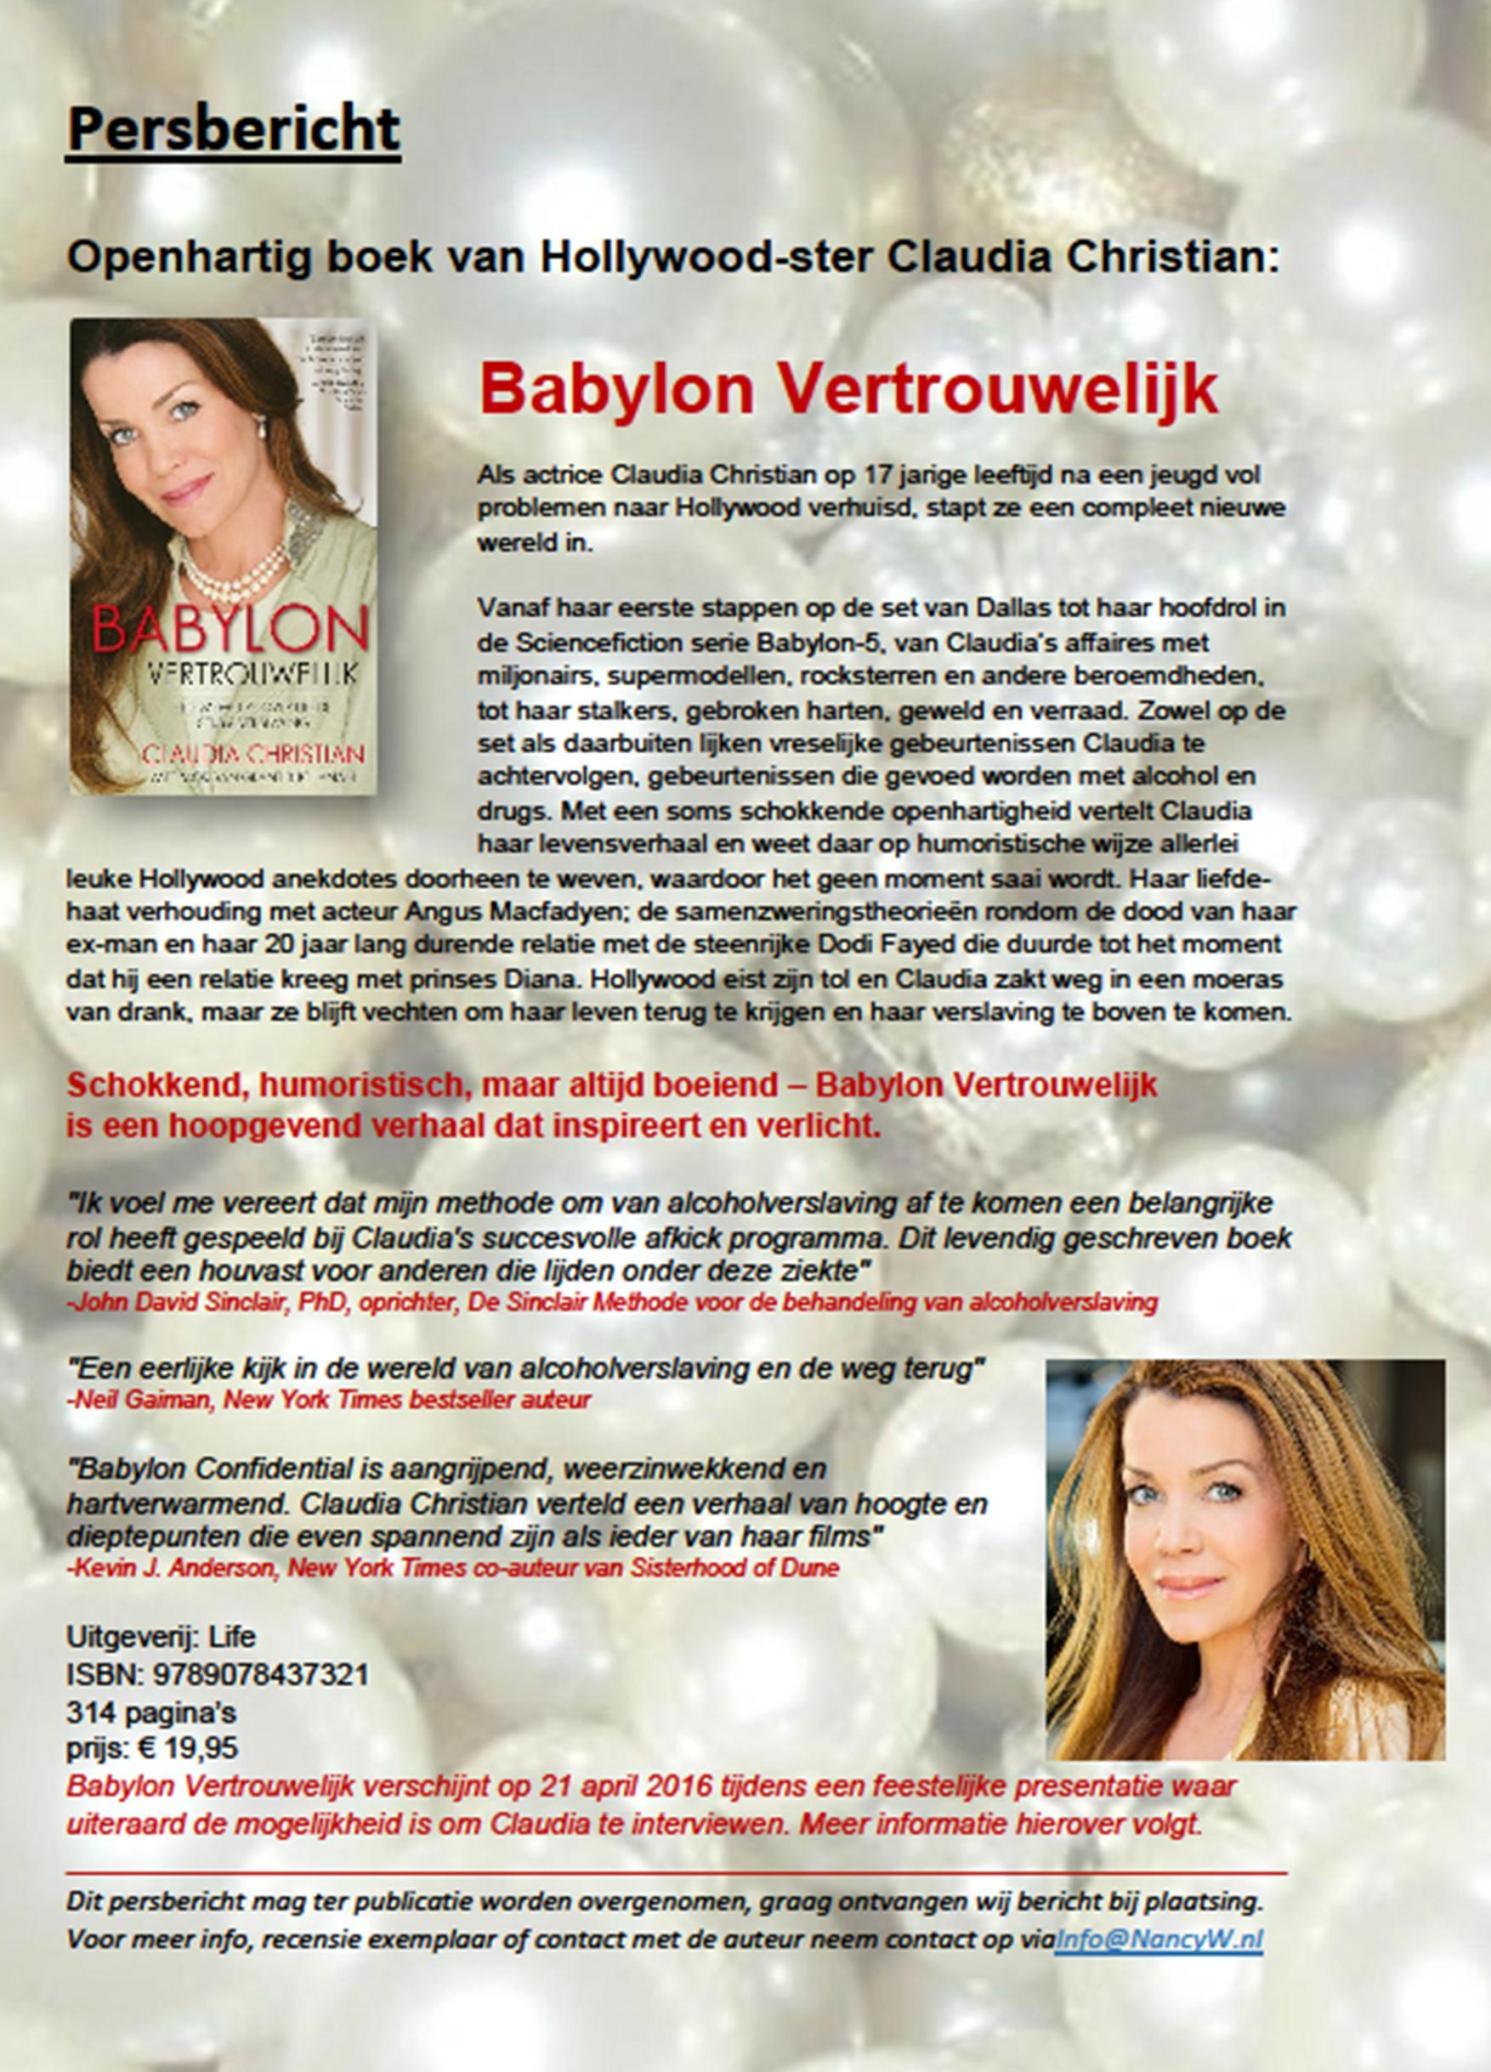 Persbericht Babylon Vertrouwelijk - Claudia Christian